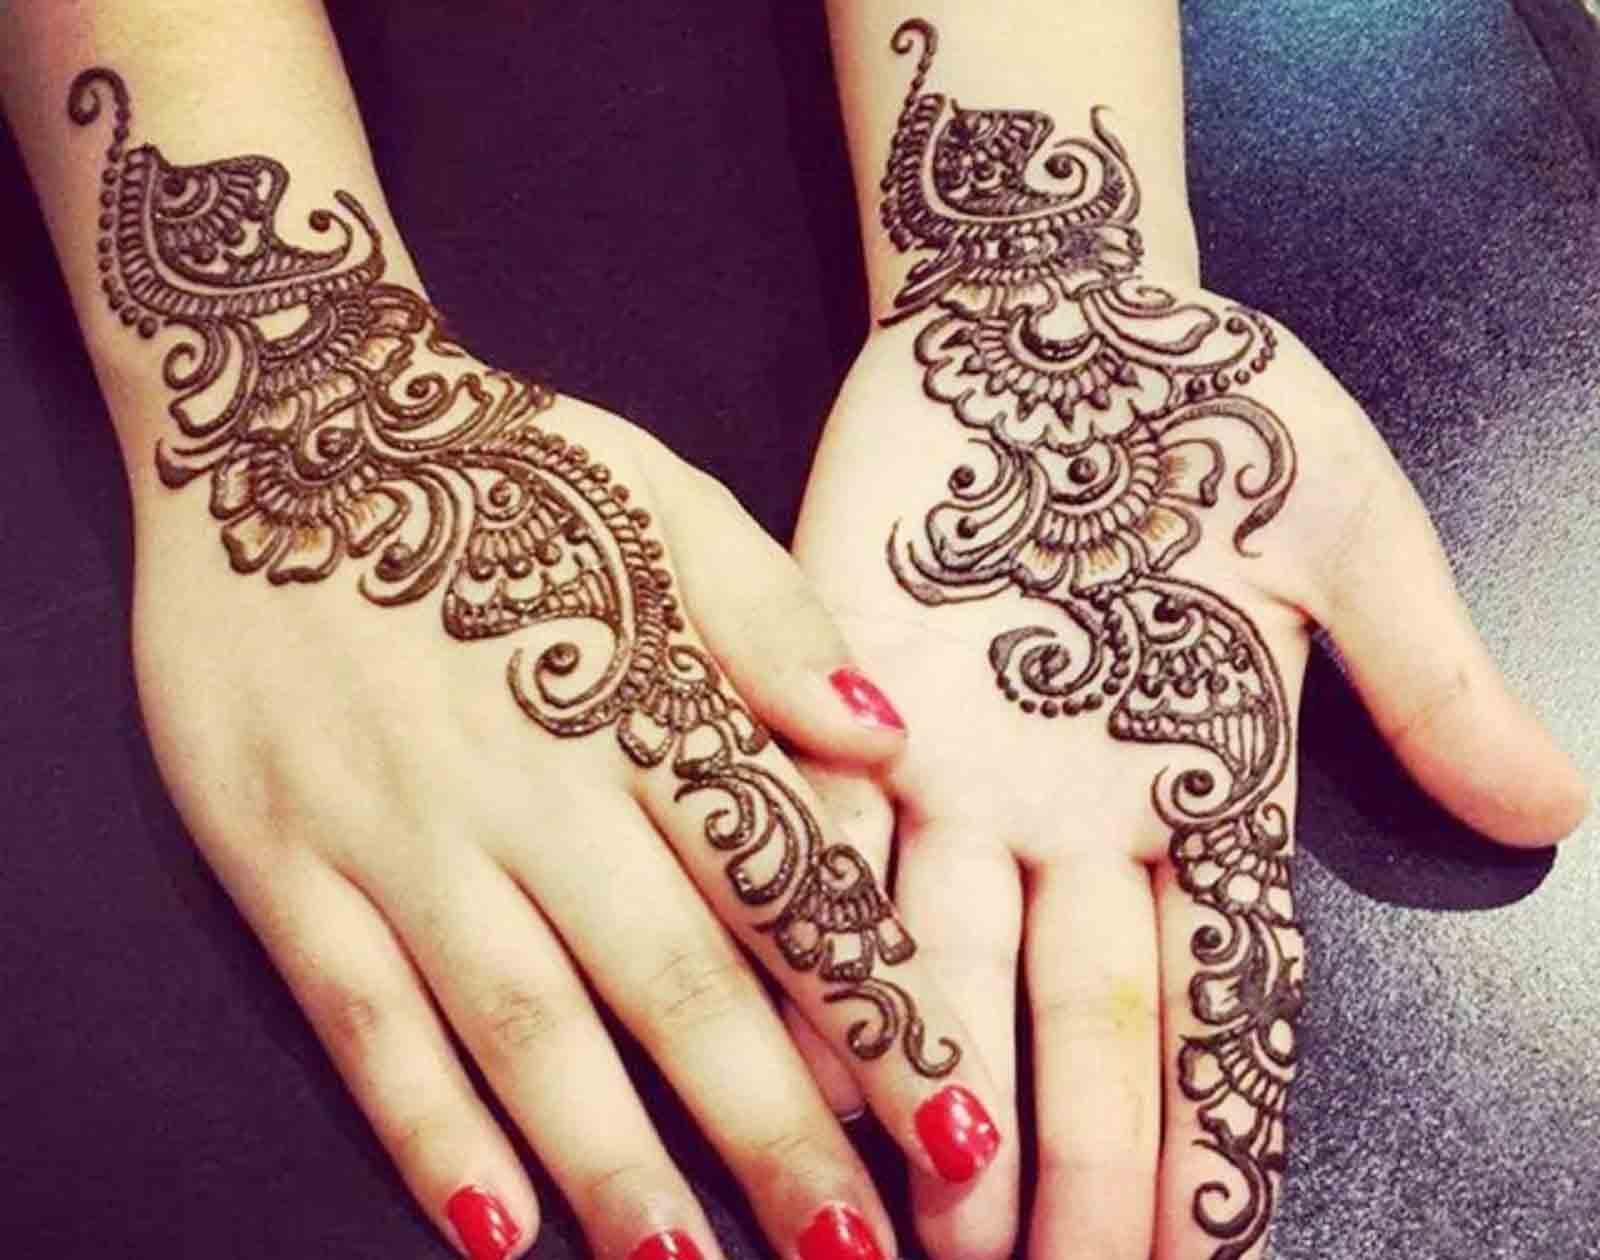 Mehndi Designs For Hands - Back Hand Mehndi Design , HD Wallpaper & Backgrounds